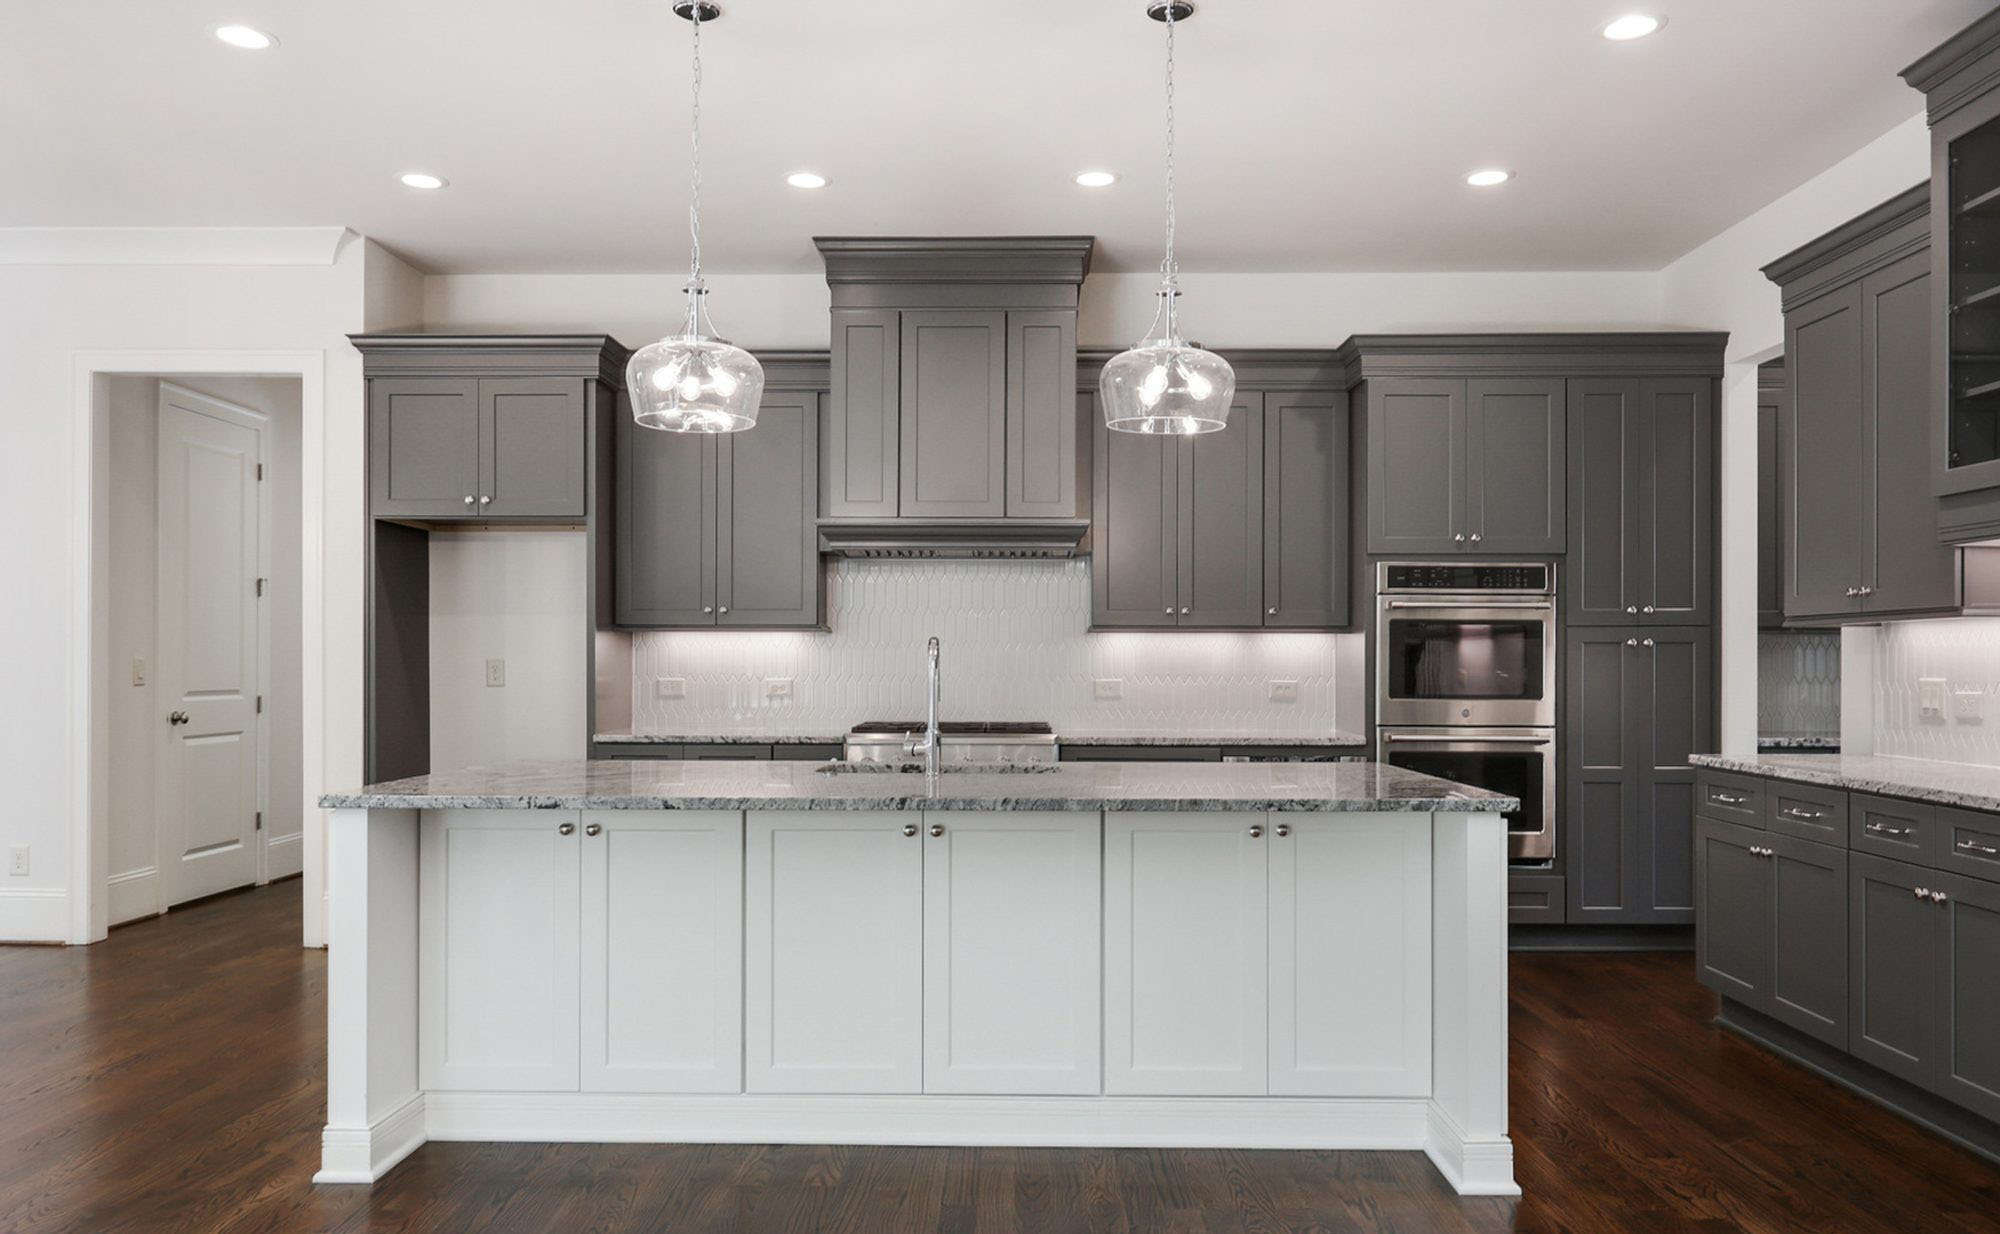 medium gray shaker style cabinets with a white island. Dark brown hardwood floors.